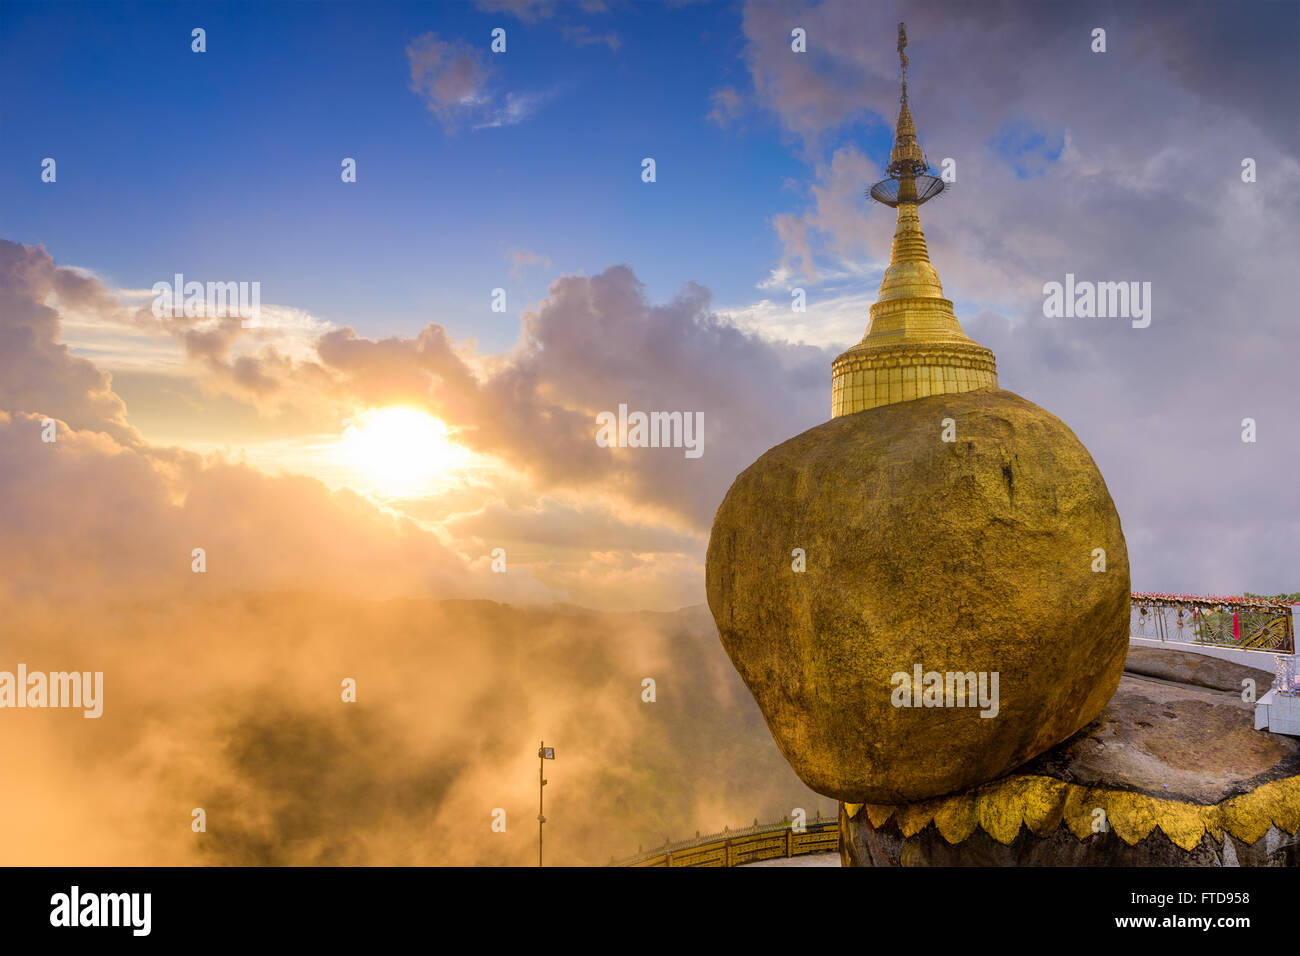 Golden Rock of Mt. Kyaiktiyo, Myanmar. - Stock Image